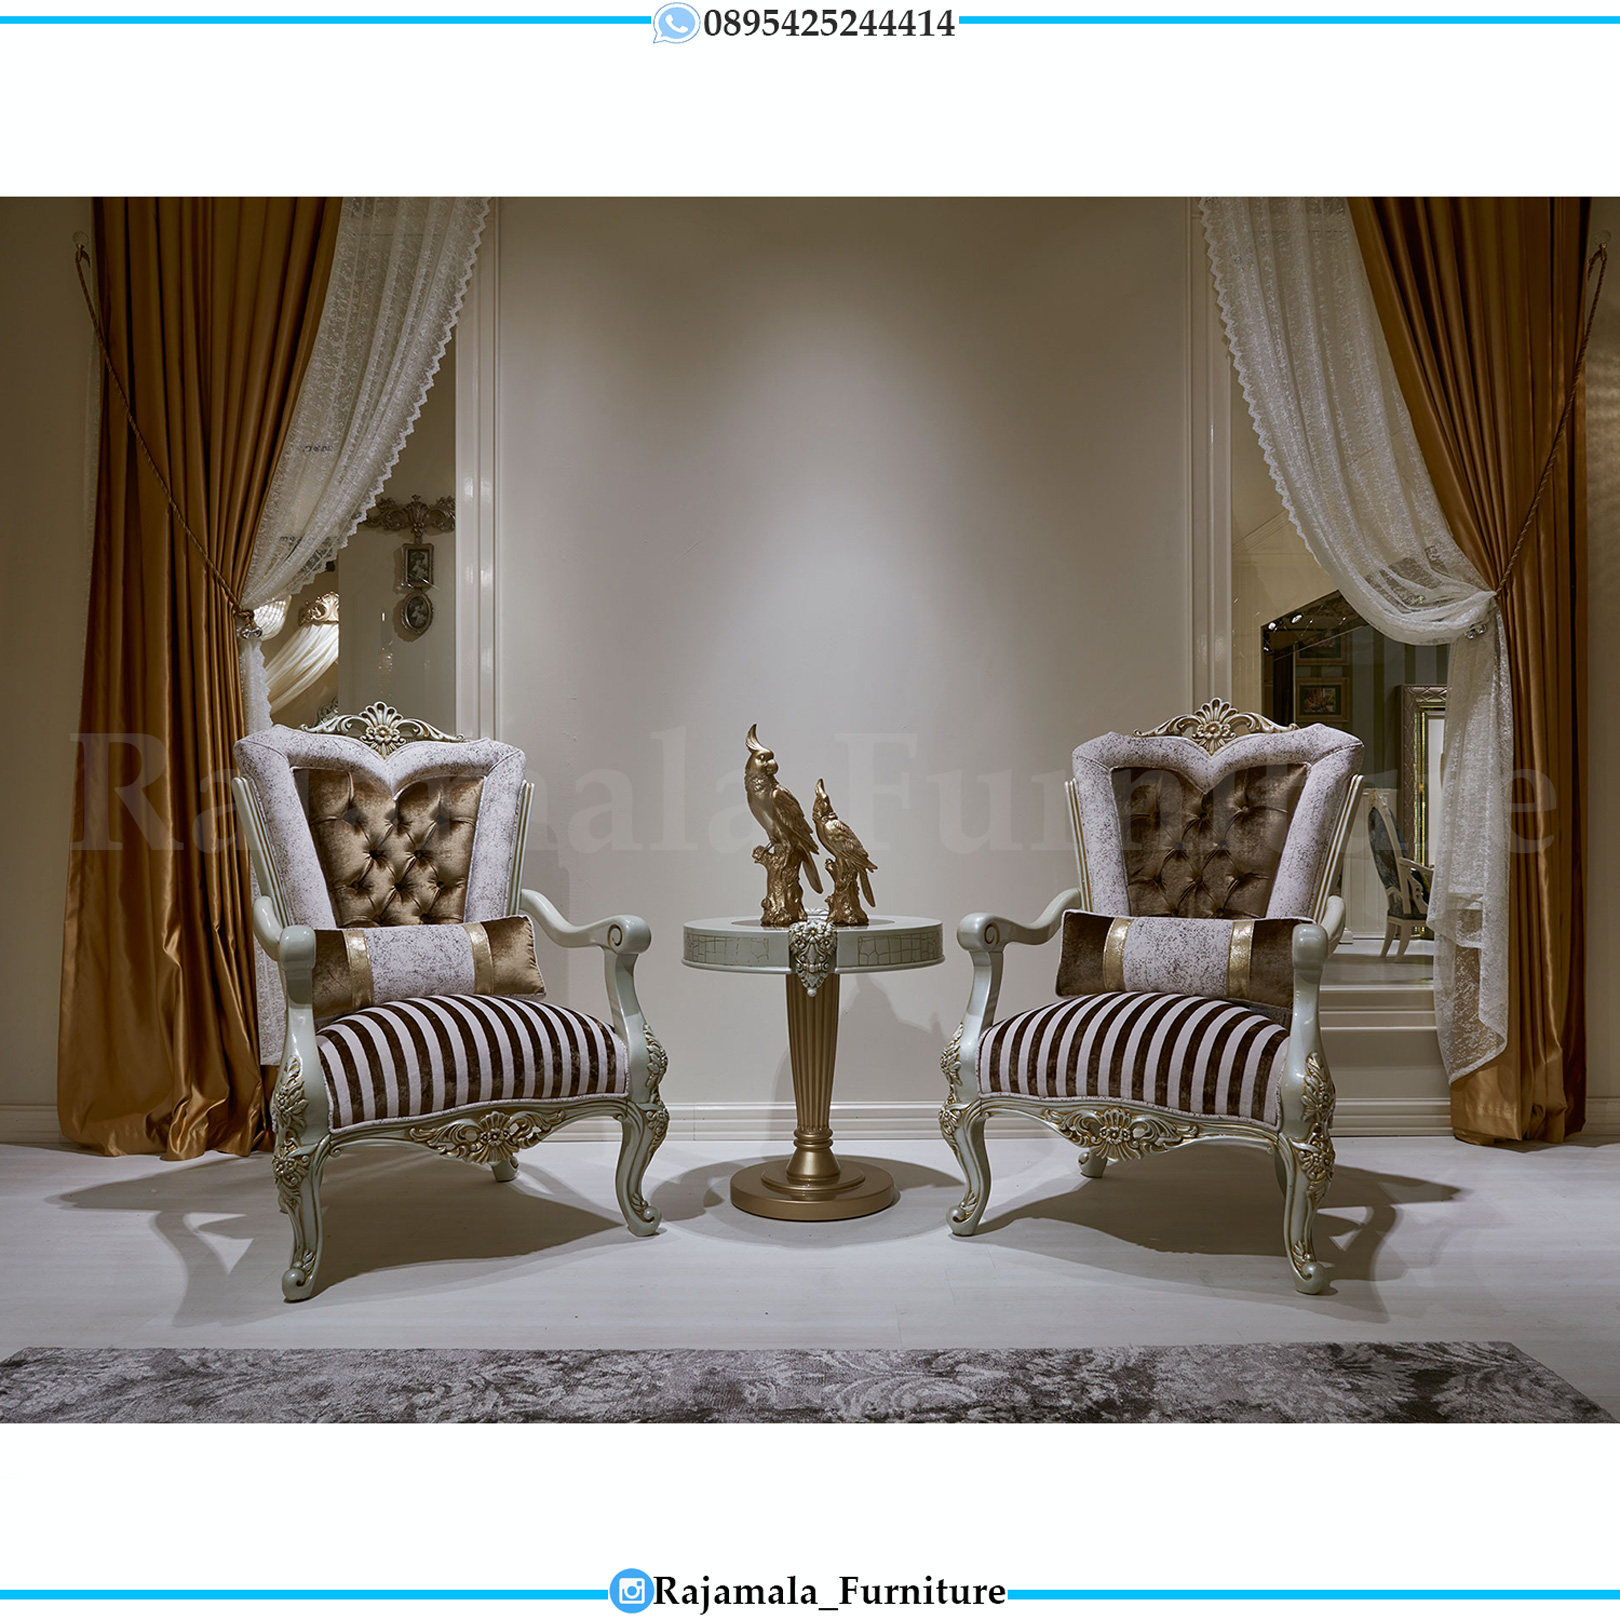 Sofa Tamu Mewah Ukiran Jepara Luxury Furniture Indonesia RM-0142